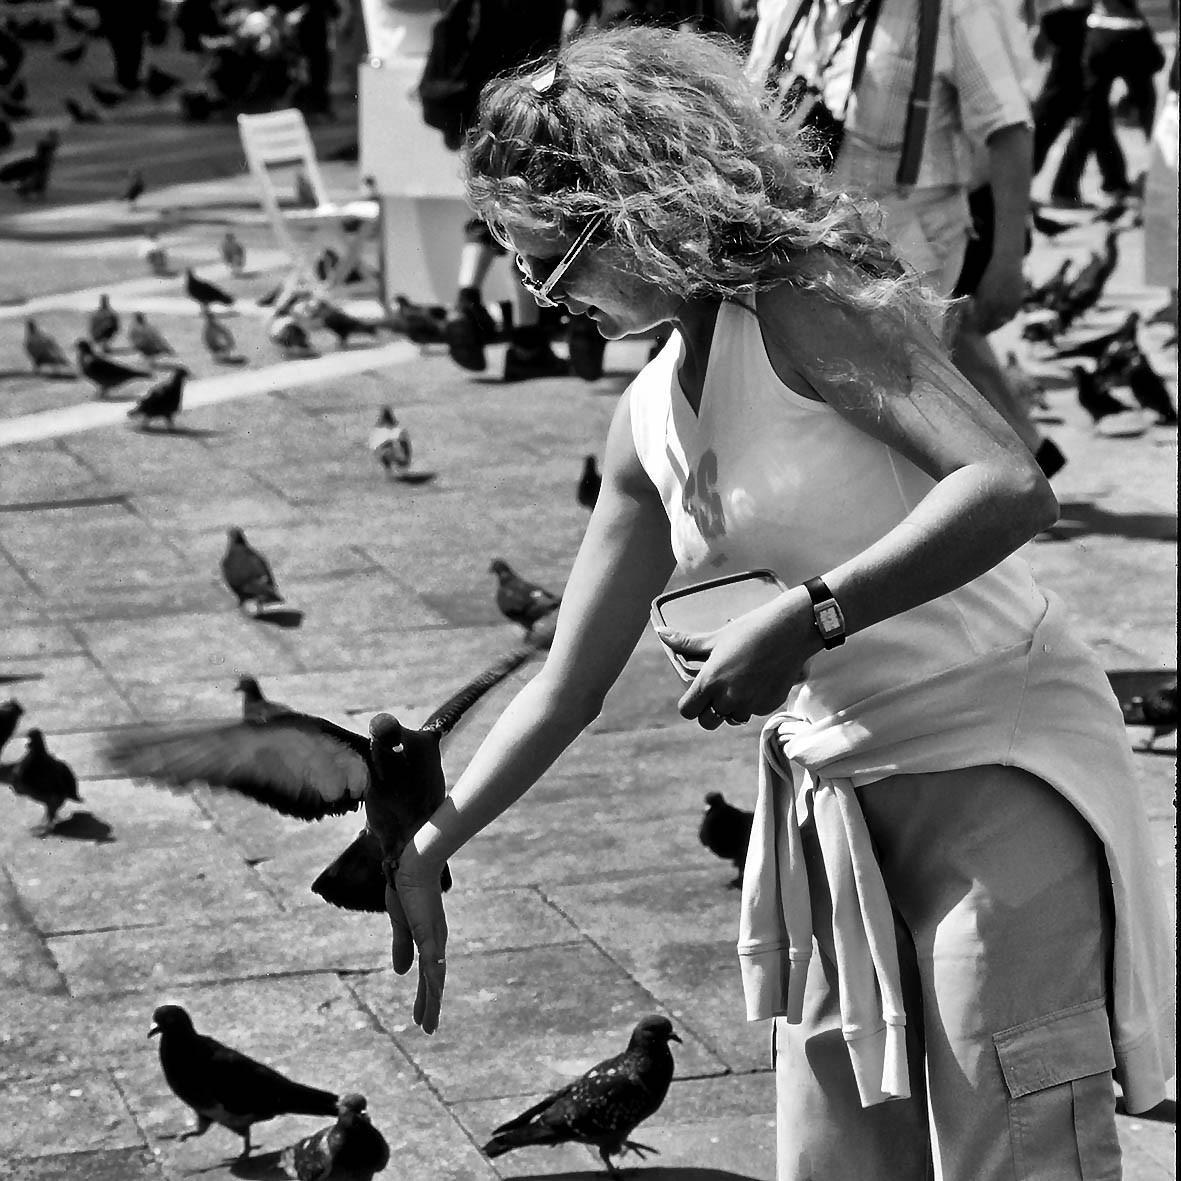 Taubenfütterung, Markusplatz, Venedig 1997